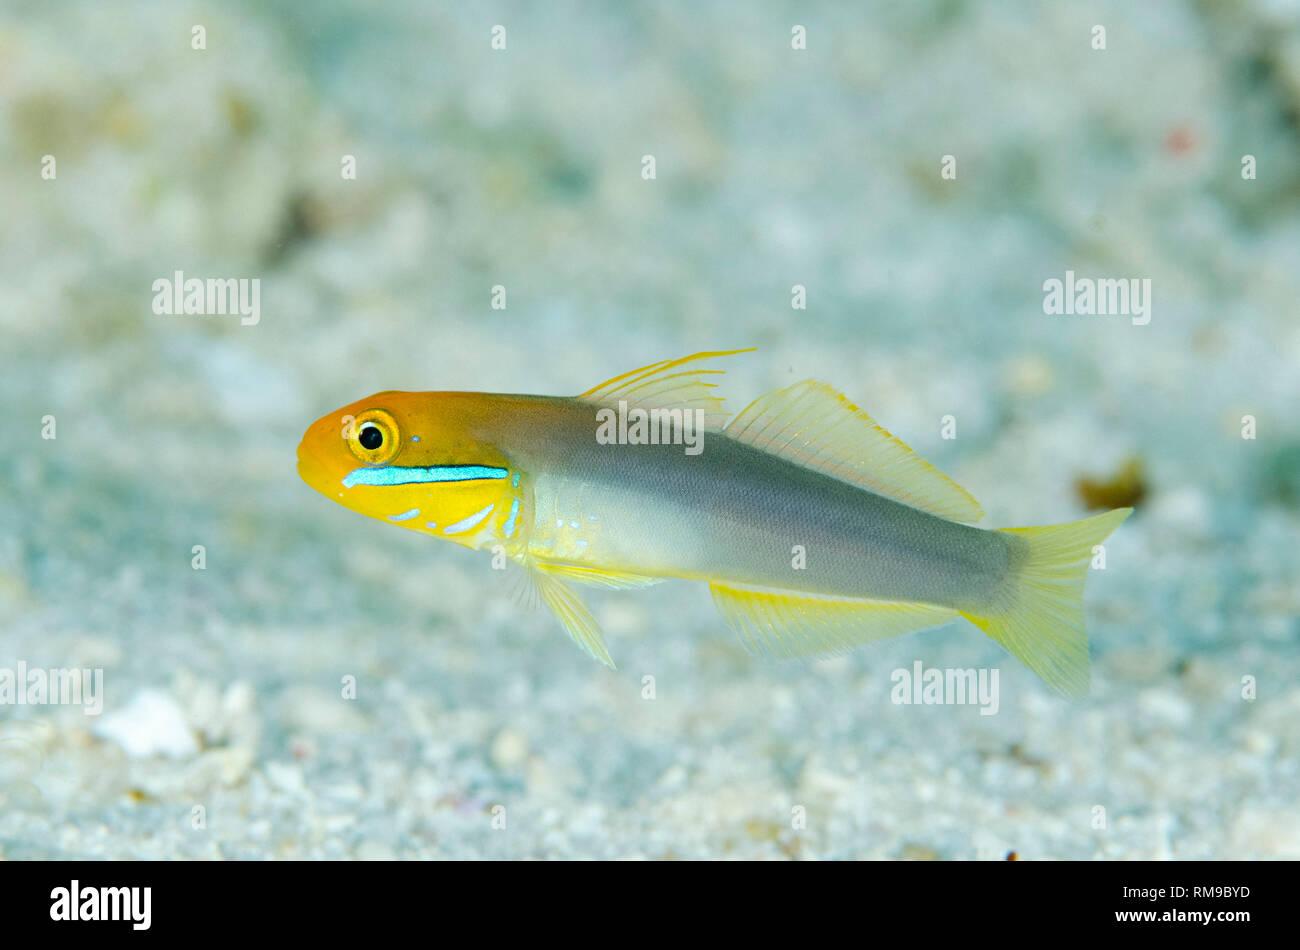 Bluestreak Goby, Valenciennea strigata, Babylon dive site, off Reta Island, near Alor, Indonesia - Stock Image